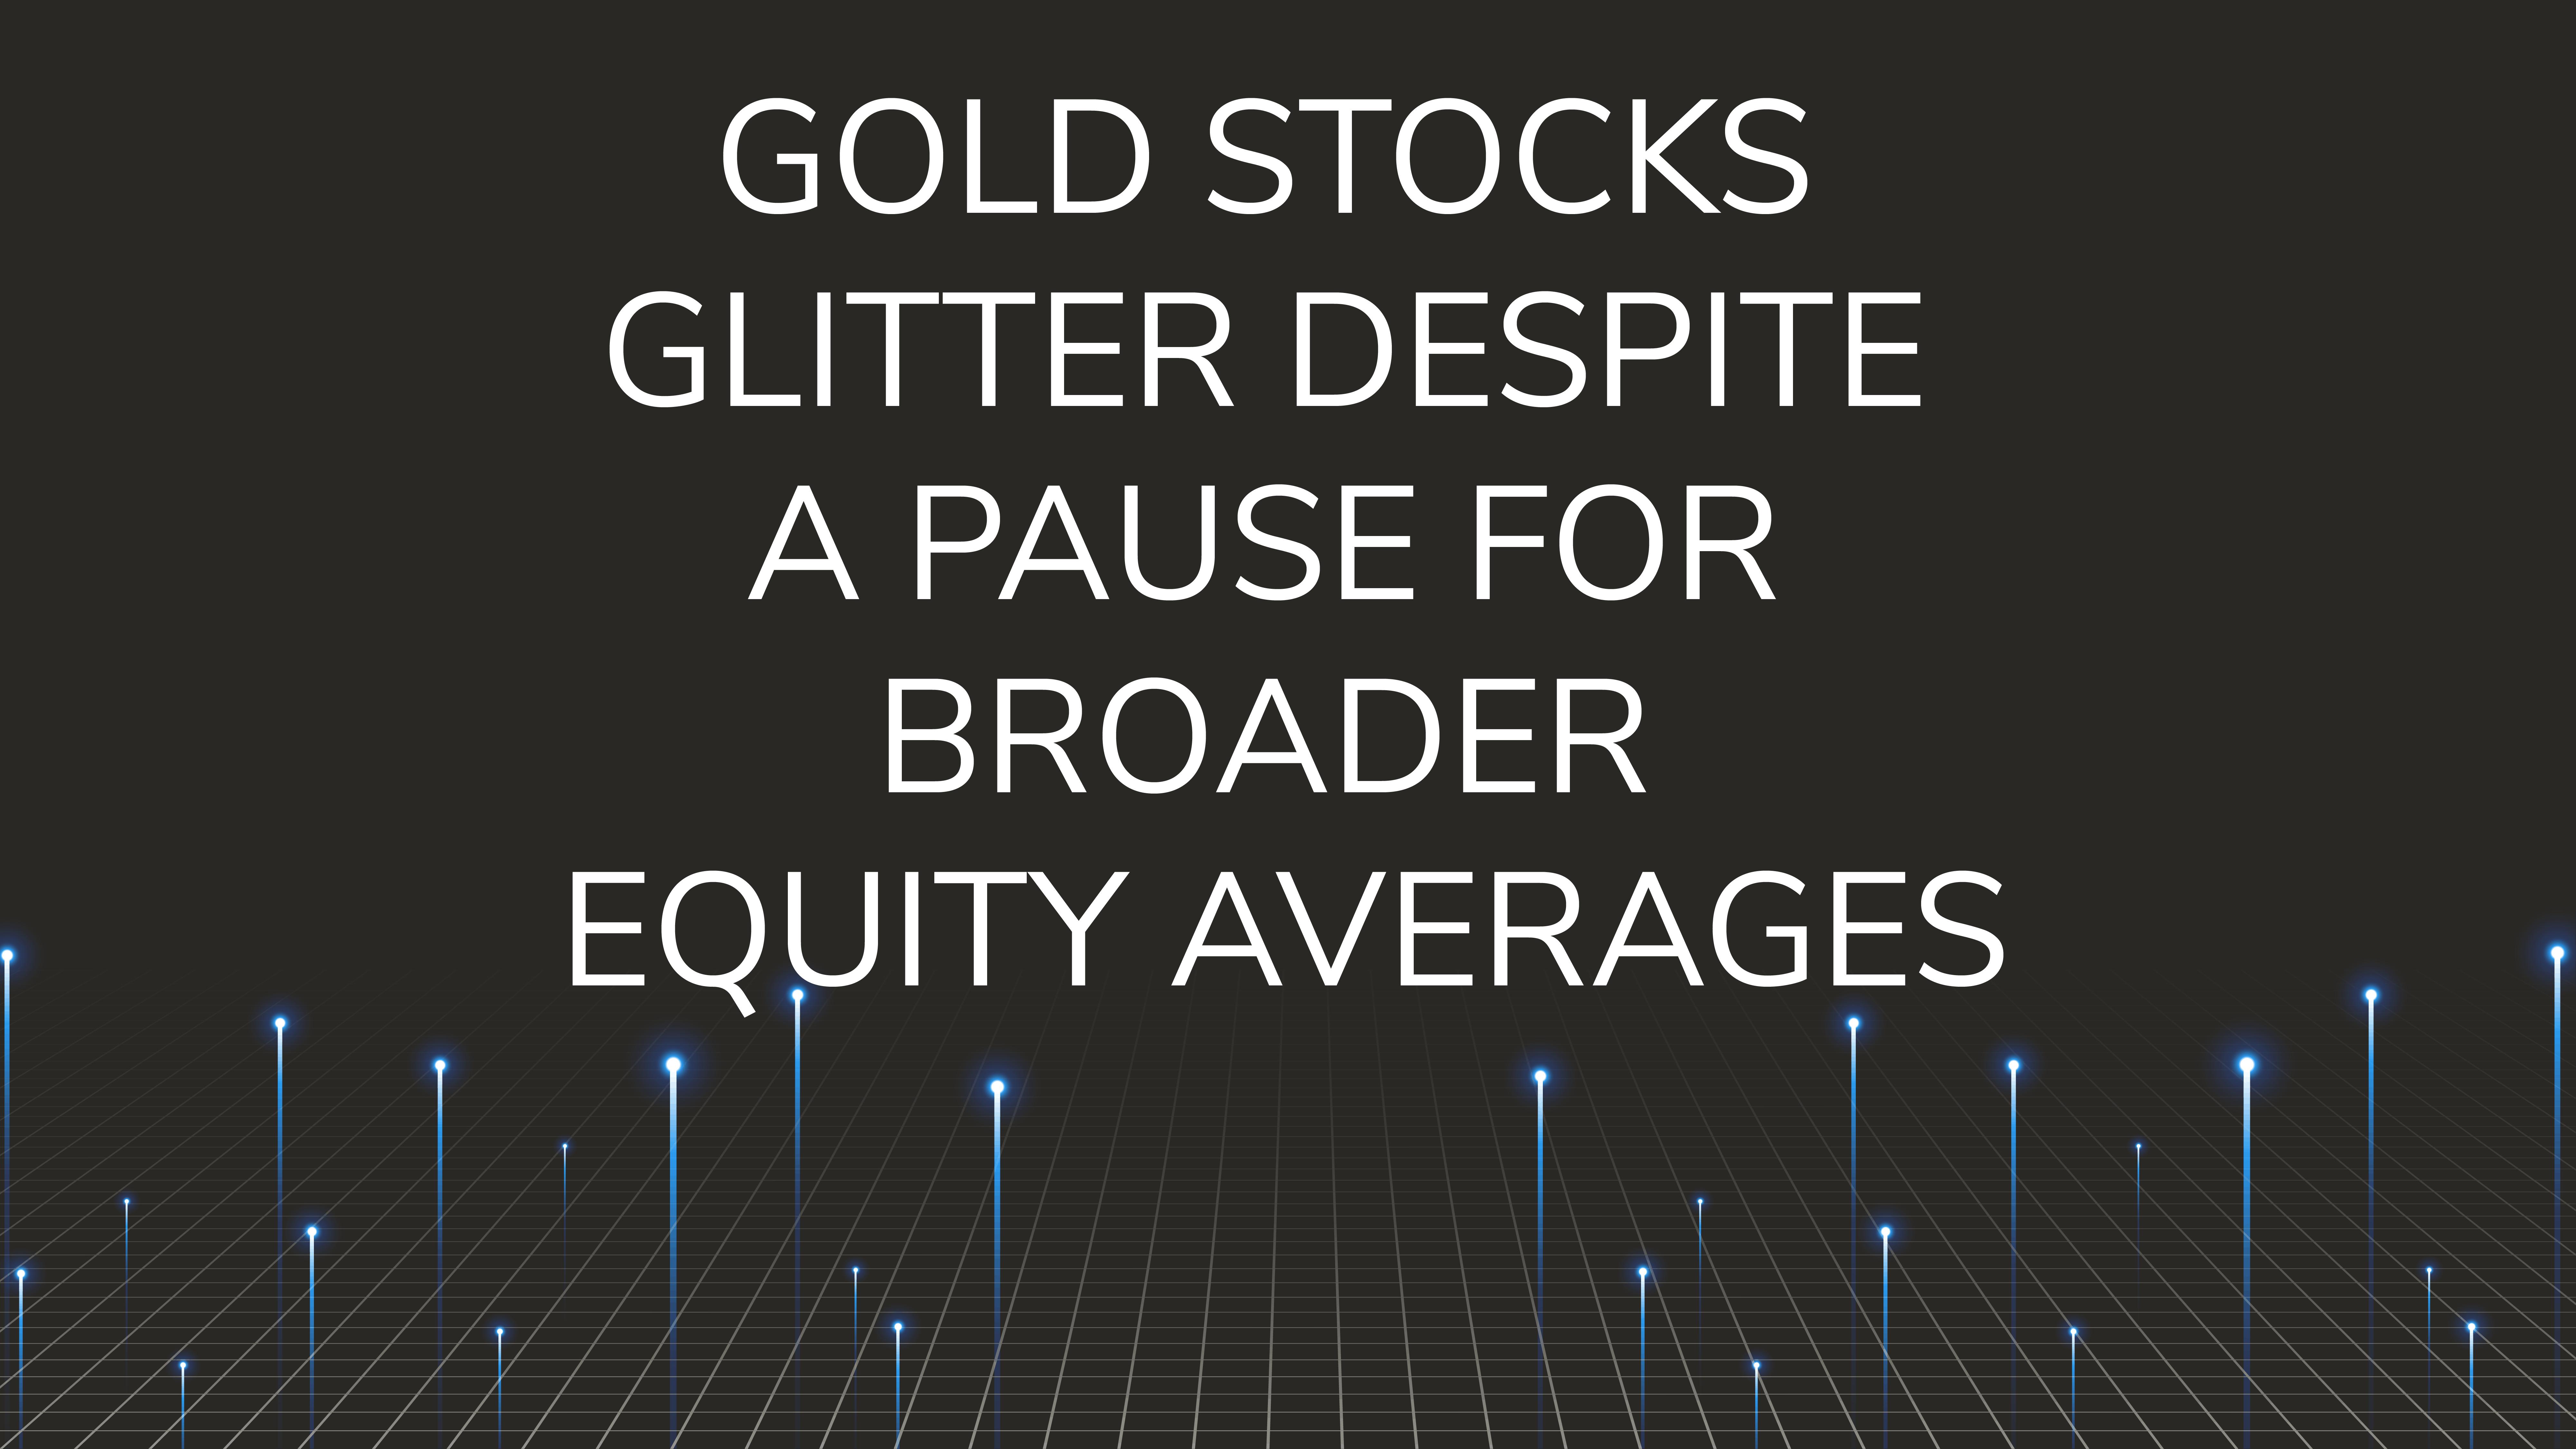 Gold Stocks Glitter Despite  a Pause for Broader Equity Averages